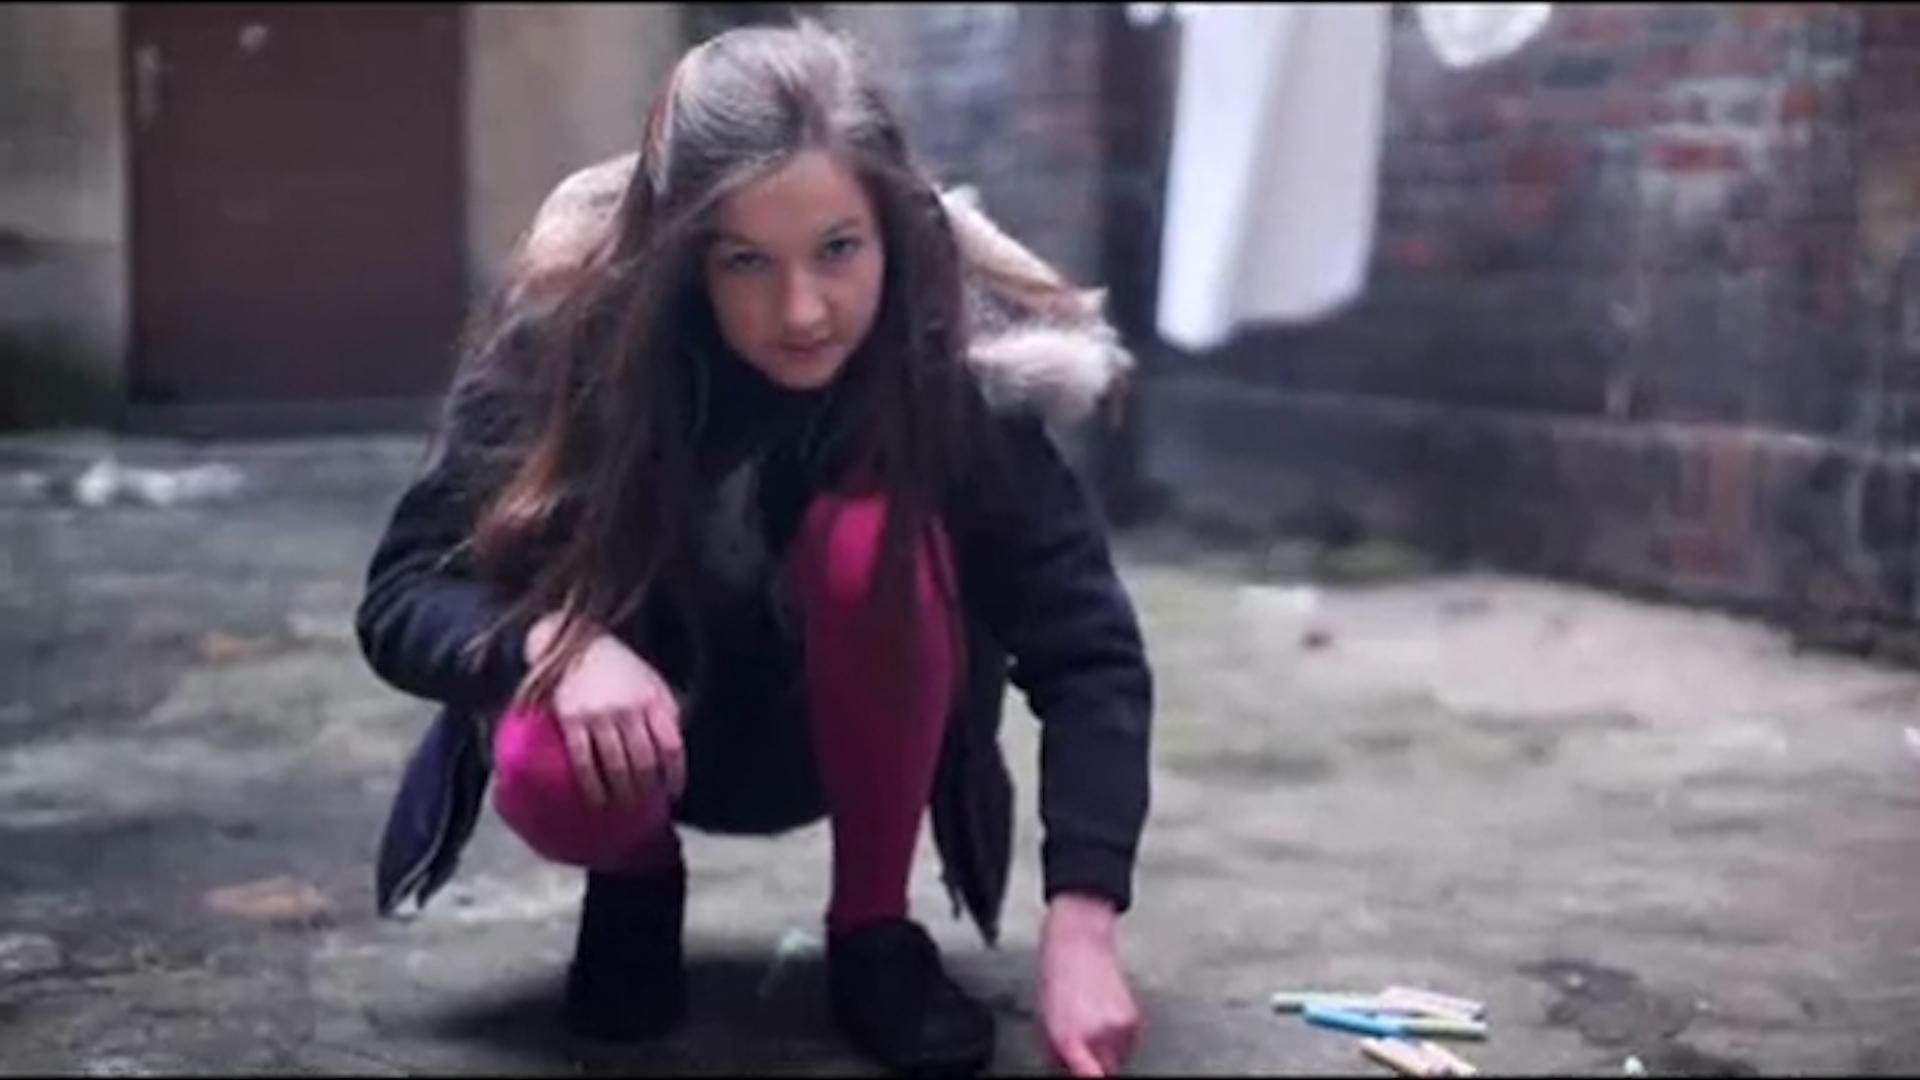 kadr z teledysku Sofa feat. O.S.T.R. Affairz